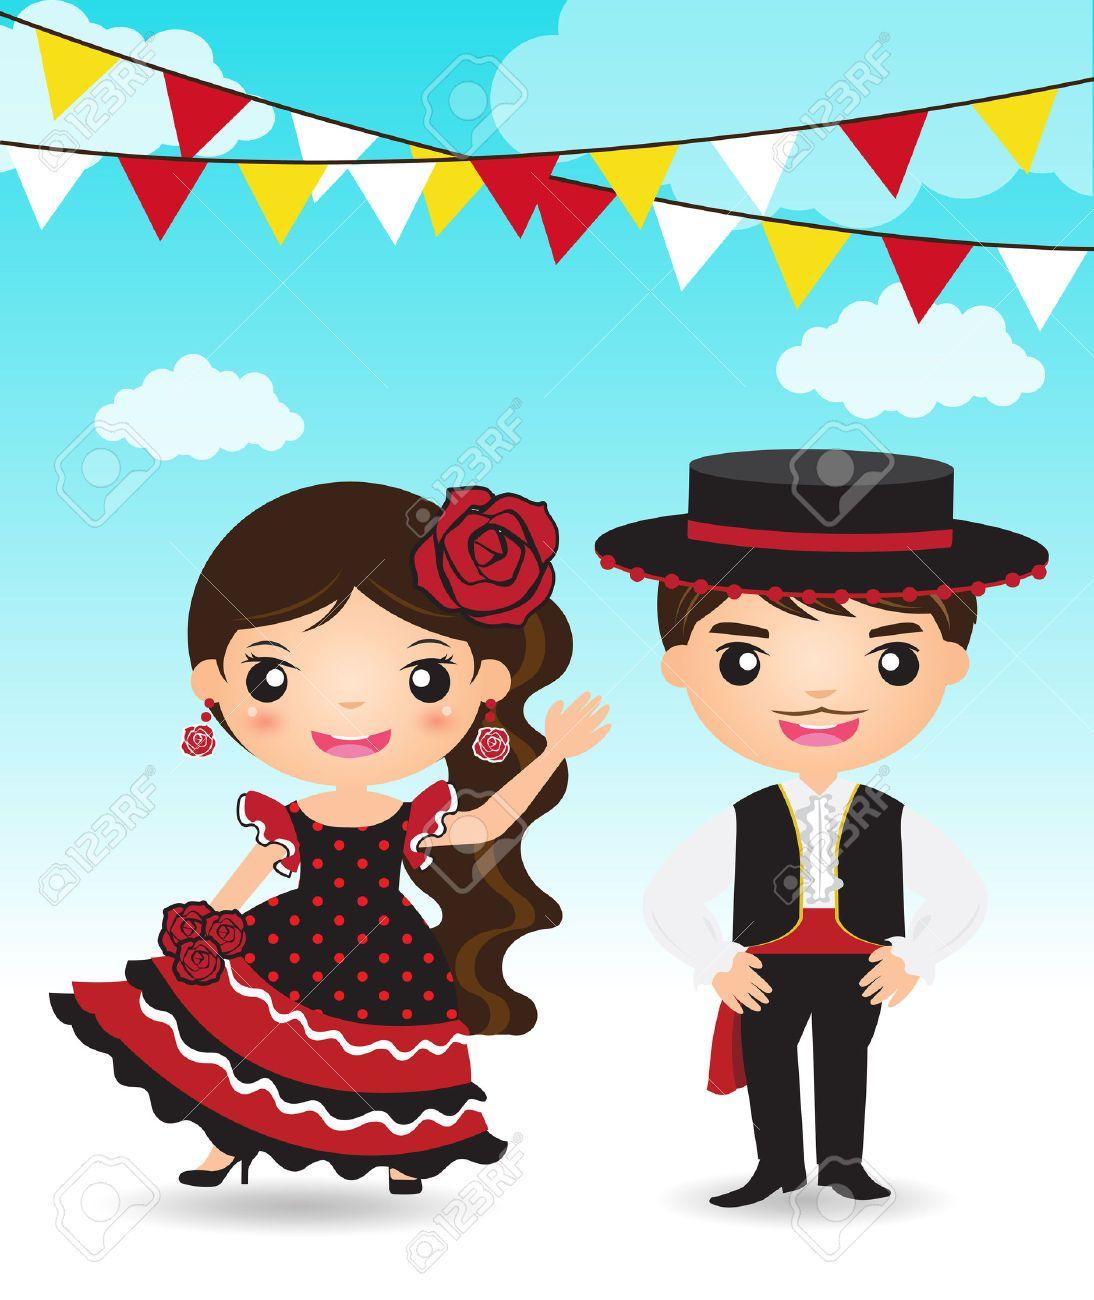 caricatura parejas con trajes tipicos - Buscar con Google ... e8b02ae253b